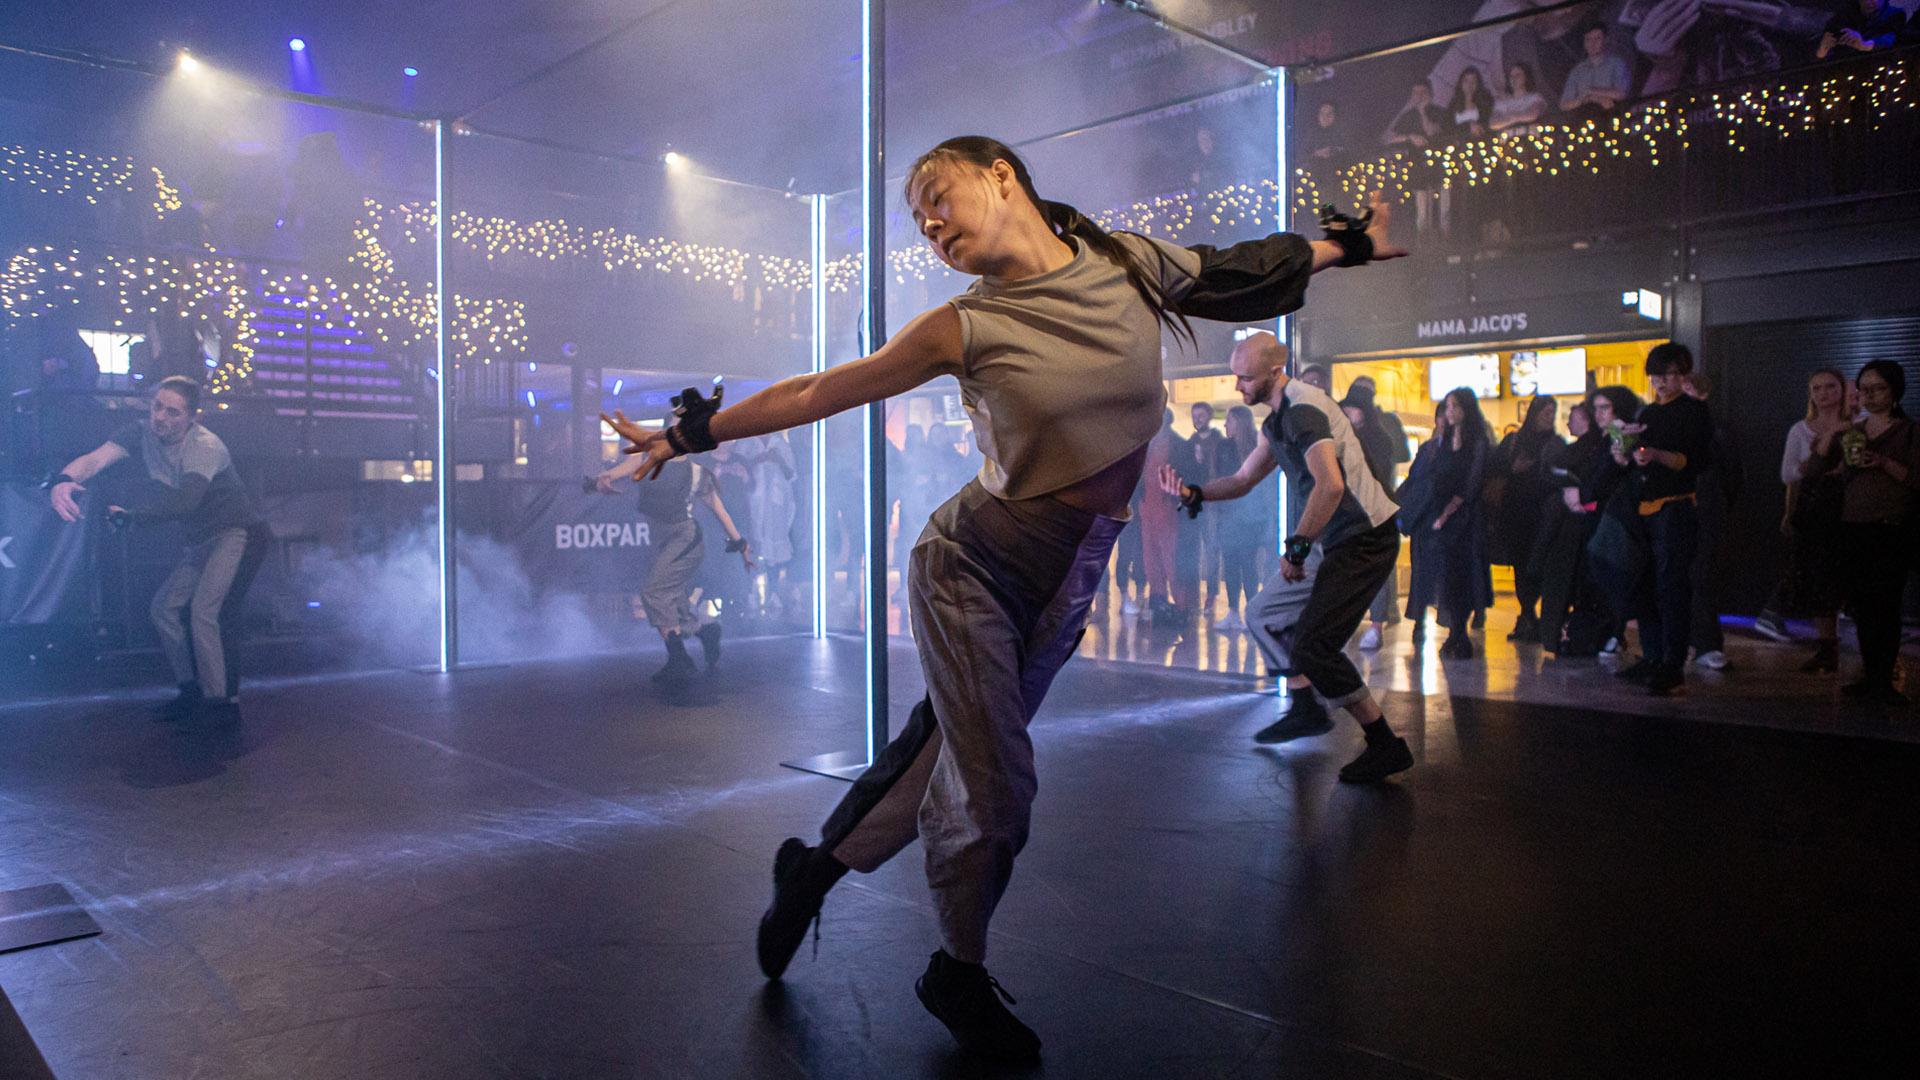 dance-event-london